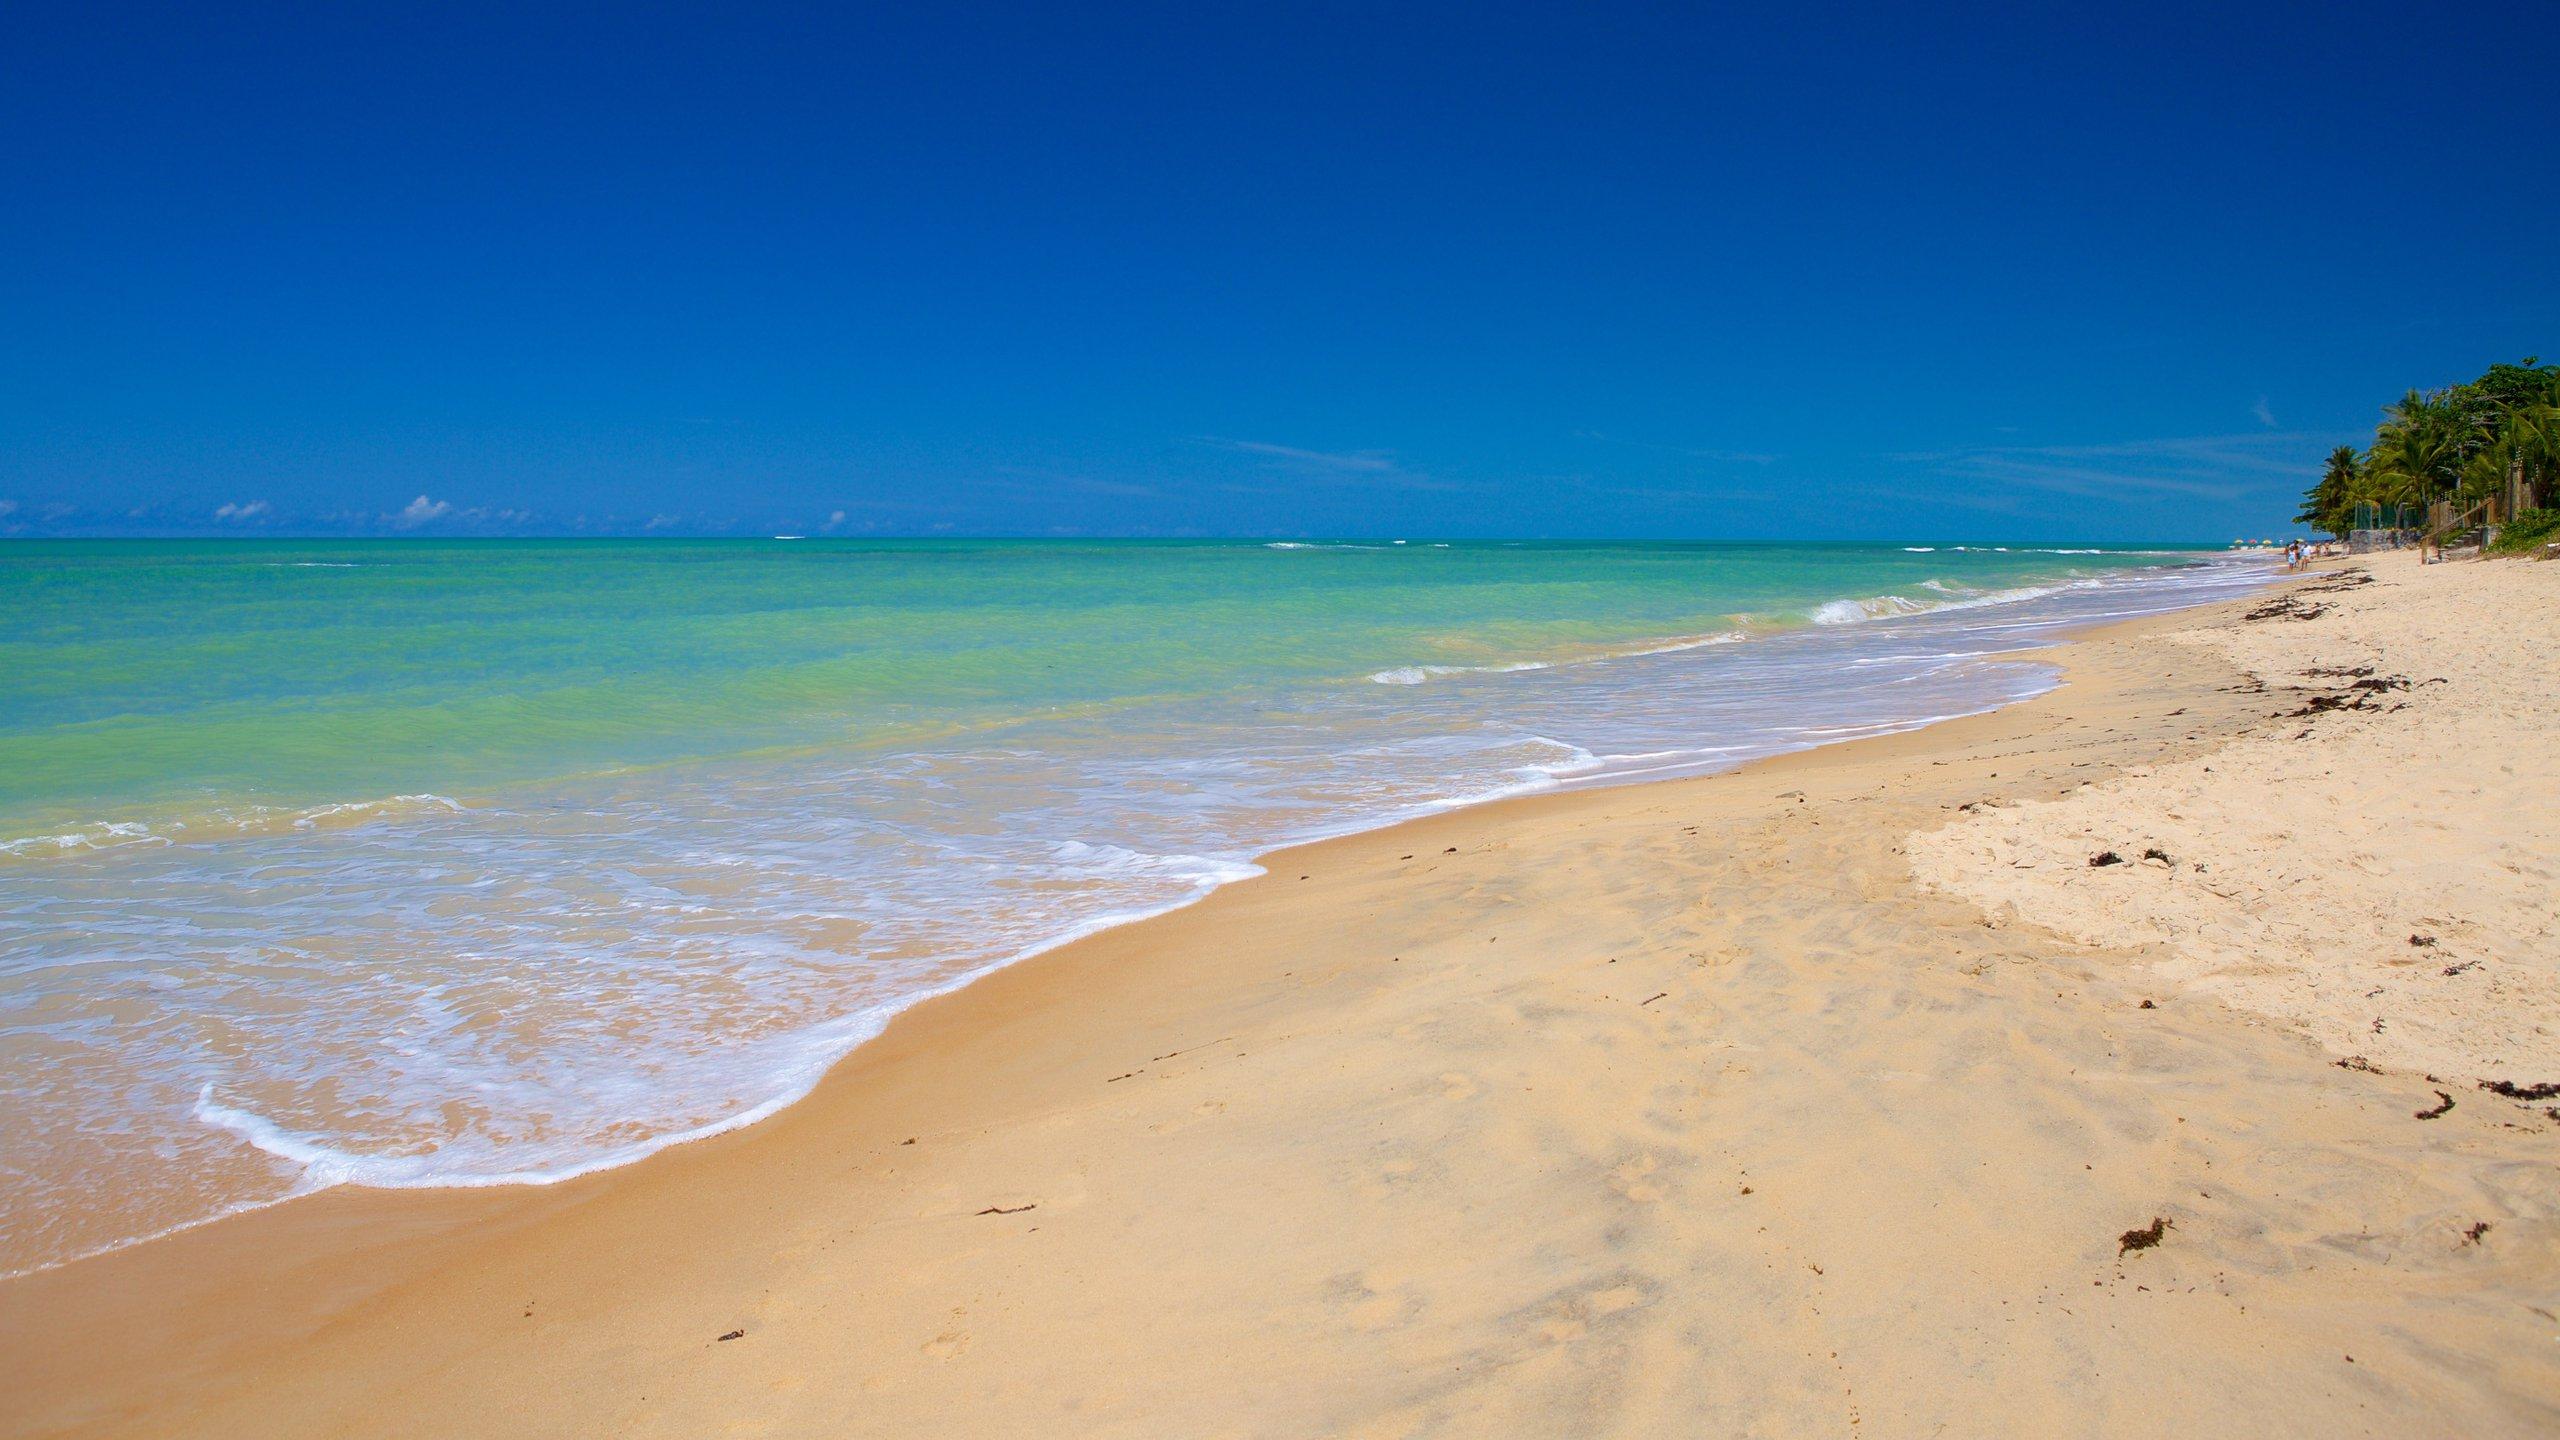 Arraial d'Ajuda, Porto Seguro, Bundesstaat Bahia, Brasilien